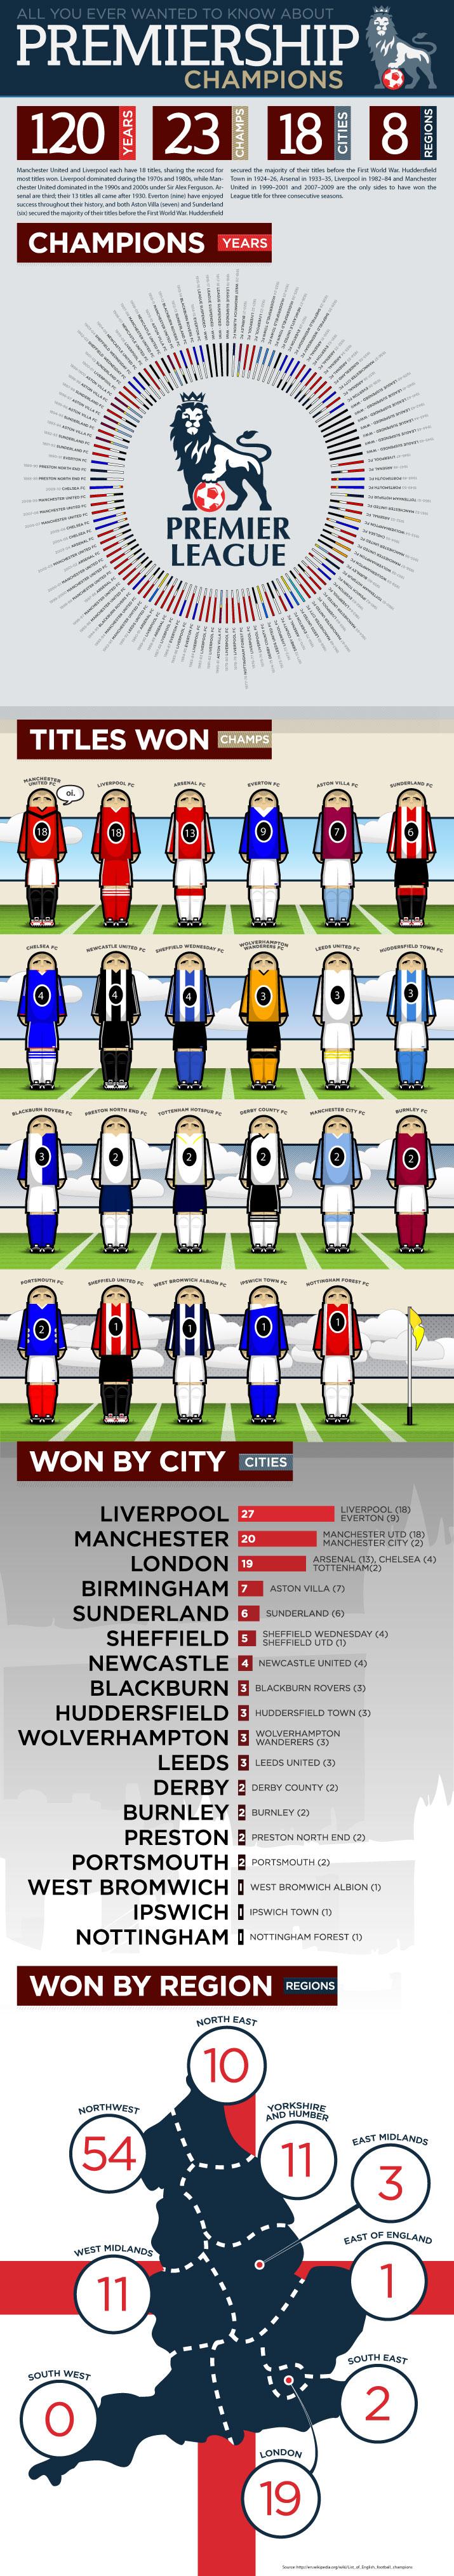 Premiership championship